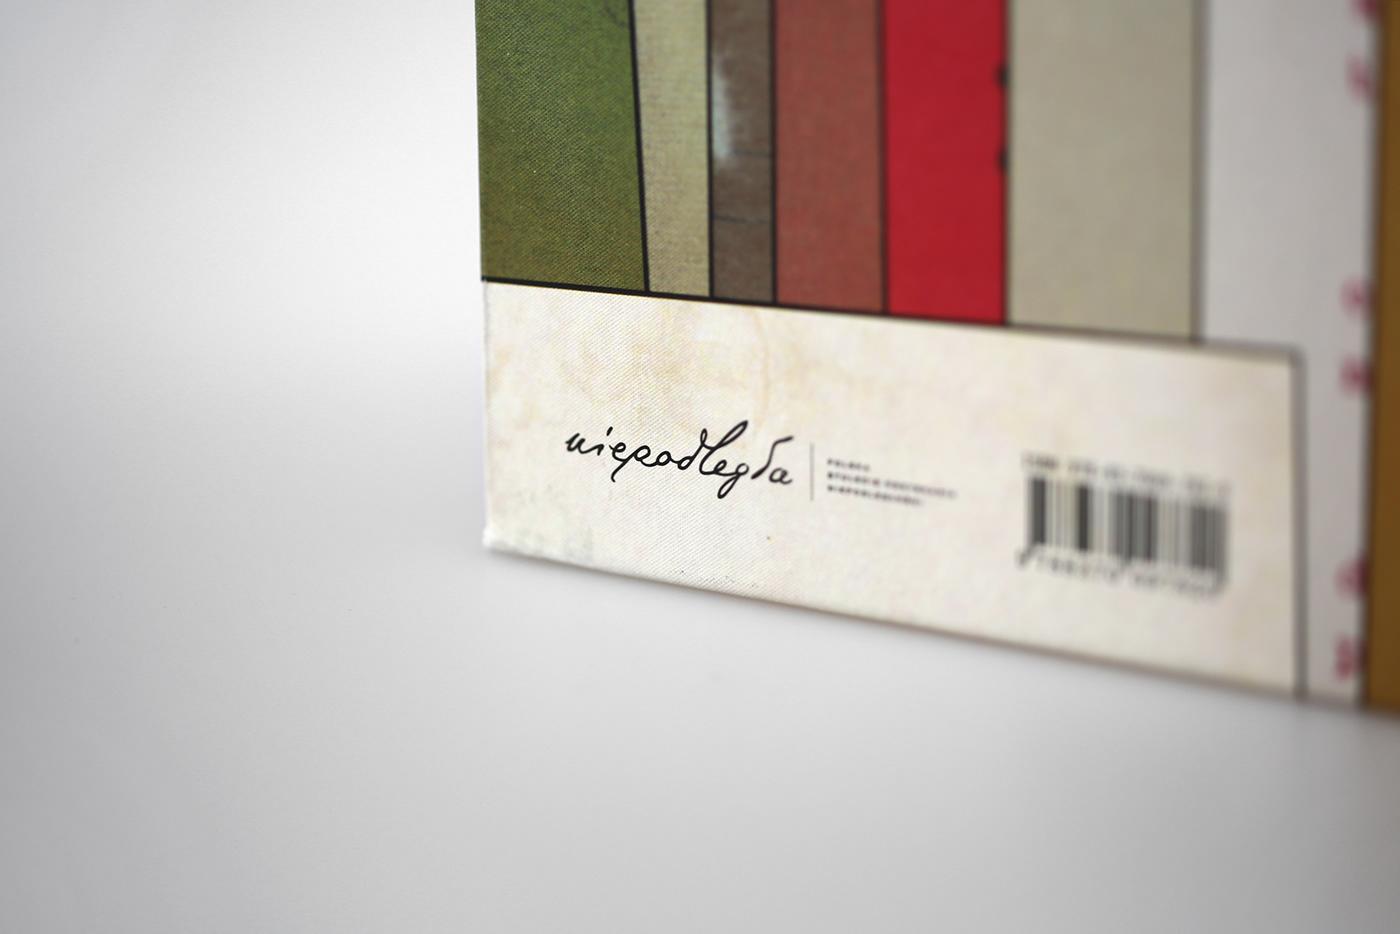 katalog,Catalogue,druki ulotne,Biblioteka Narodowa,typografia